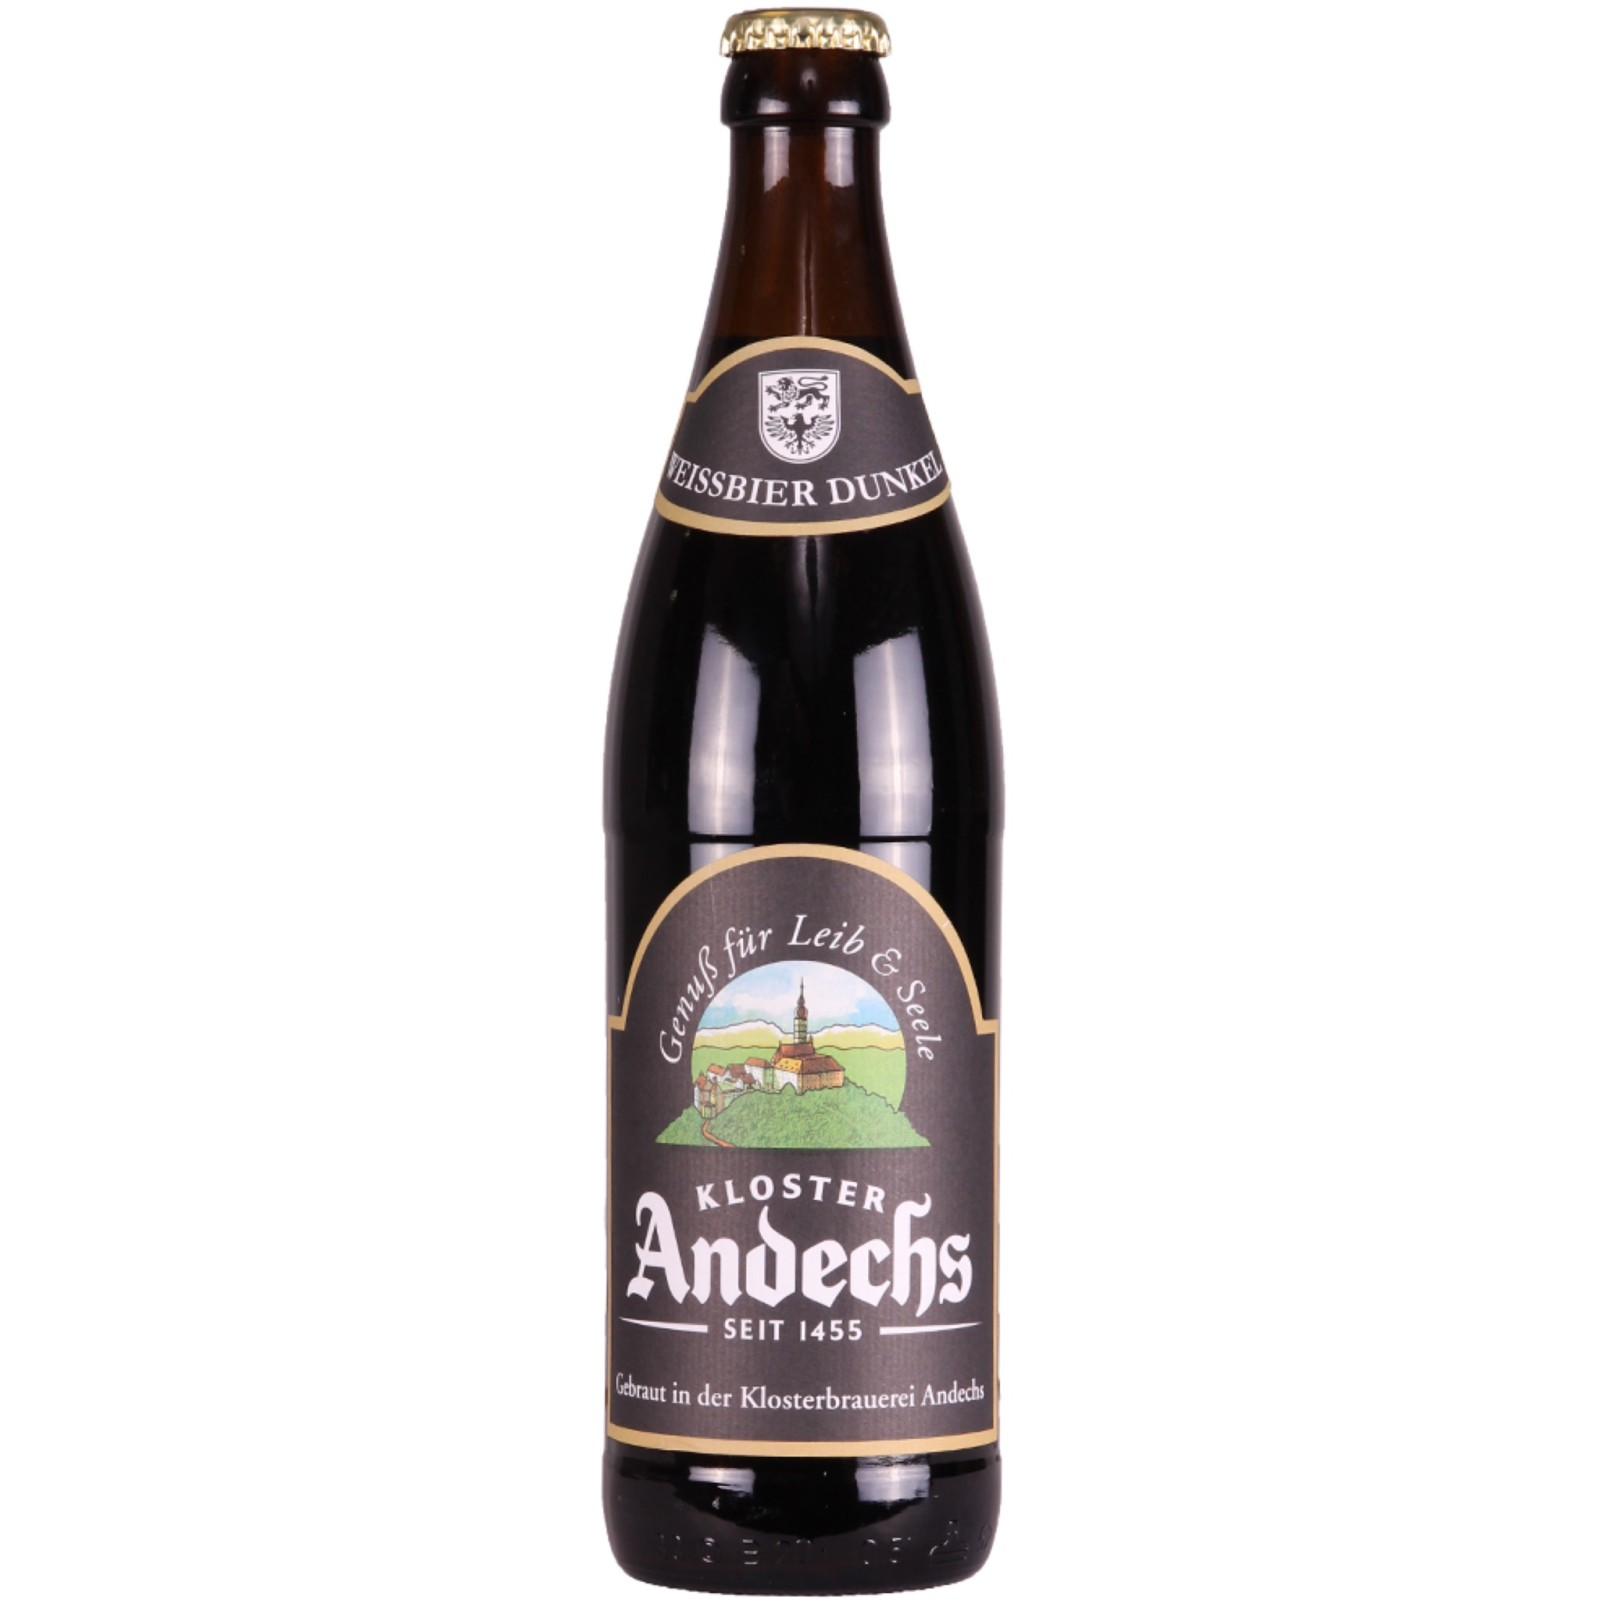 Andechs Weiss Dunkel 5% 500ml